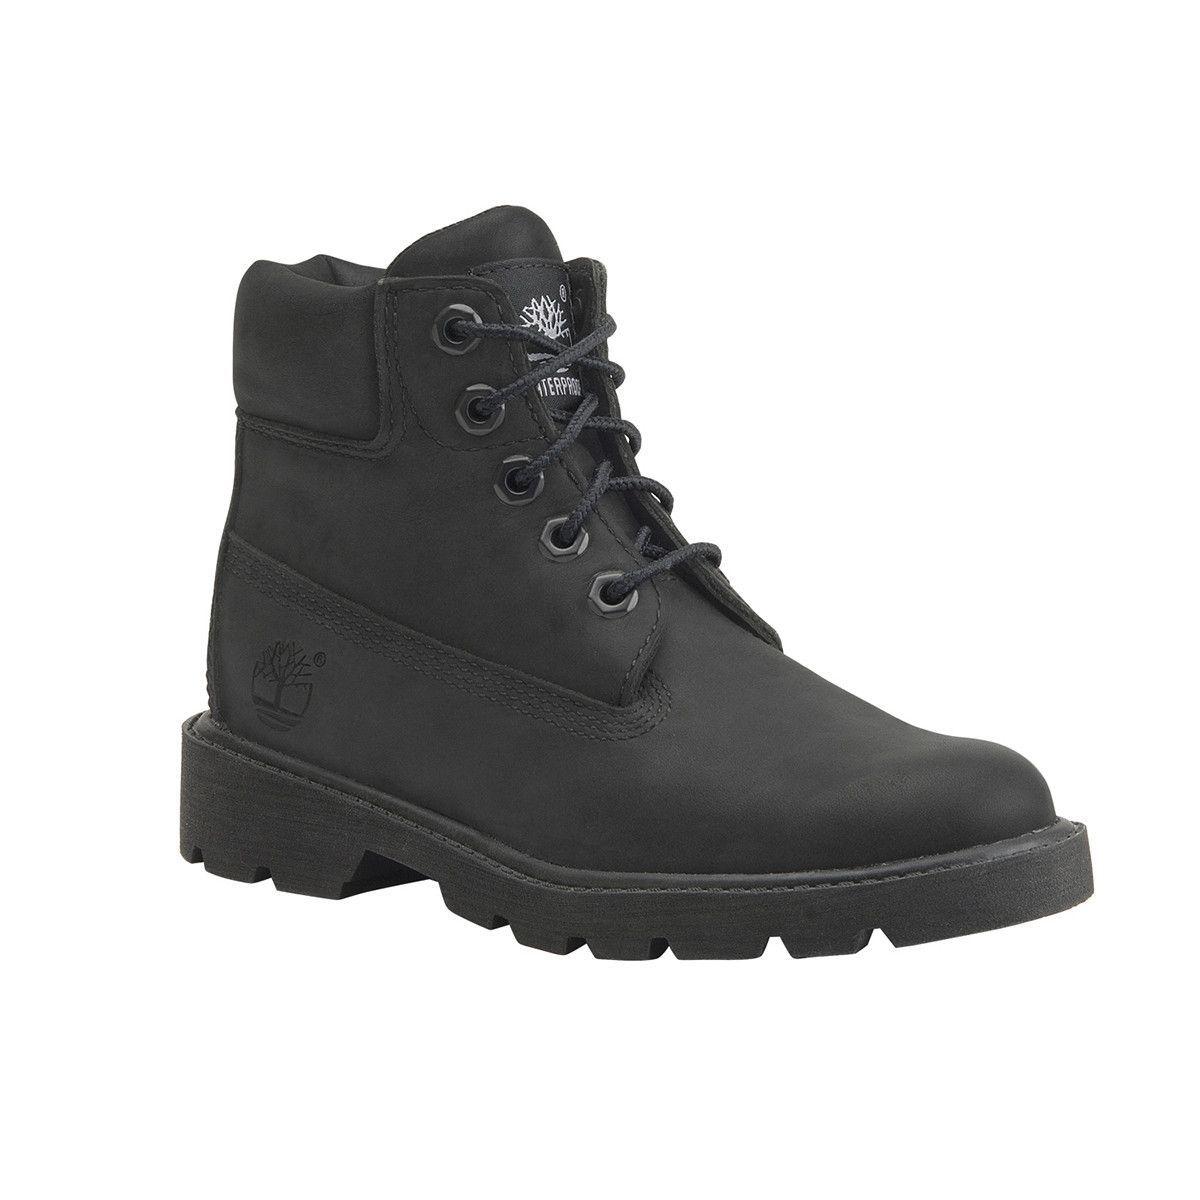 cdf57974b3 Timberland - Kids  6 Inch Classic Waterproof Boot (Toddler) - Black Nubuck